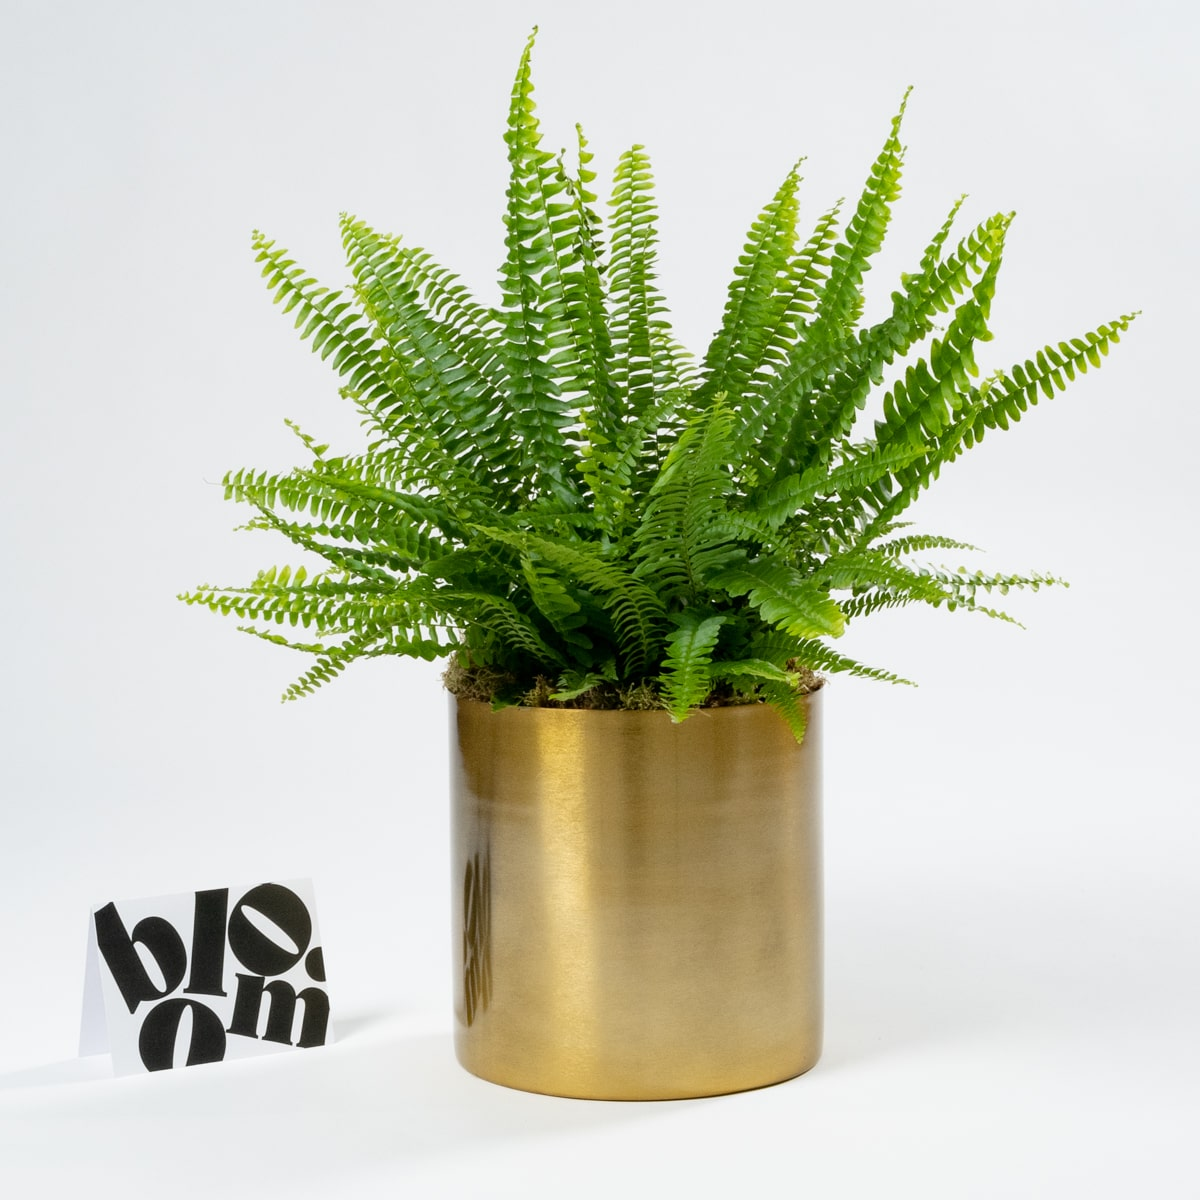 bloom - Flash Sale: Tall Brass Plant Pot & Vase